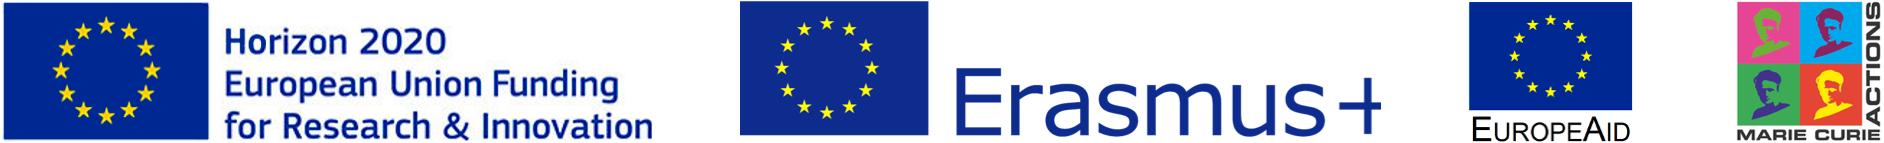 EU_logos_combined2